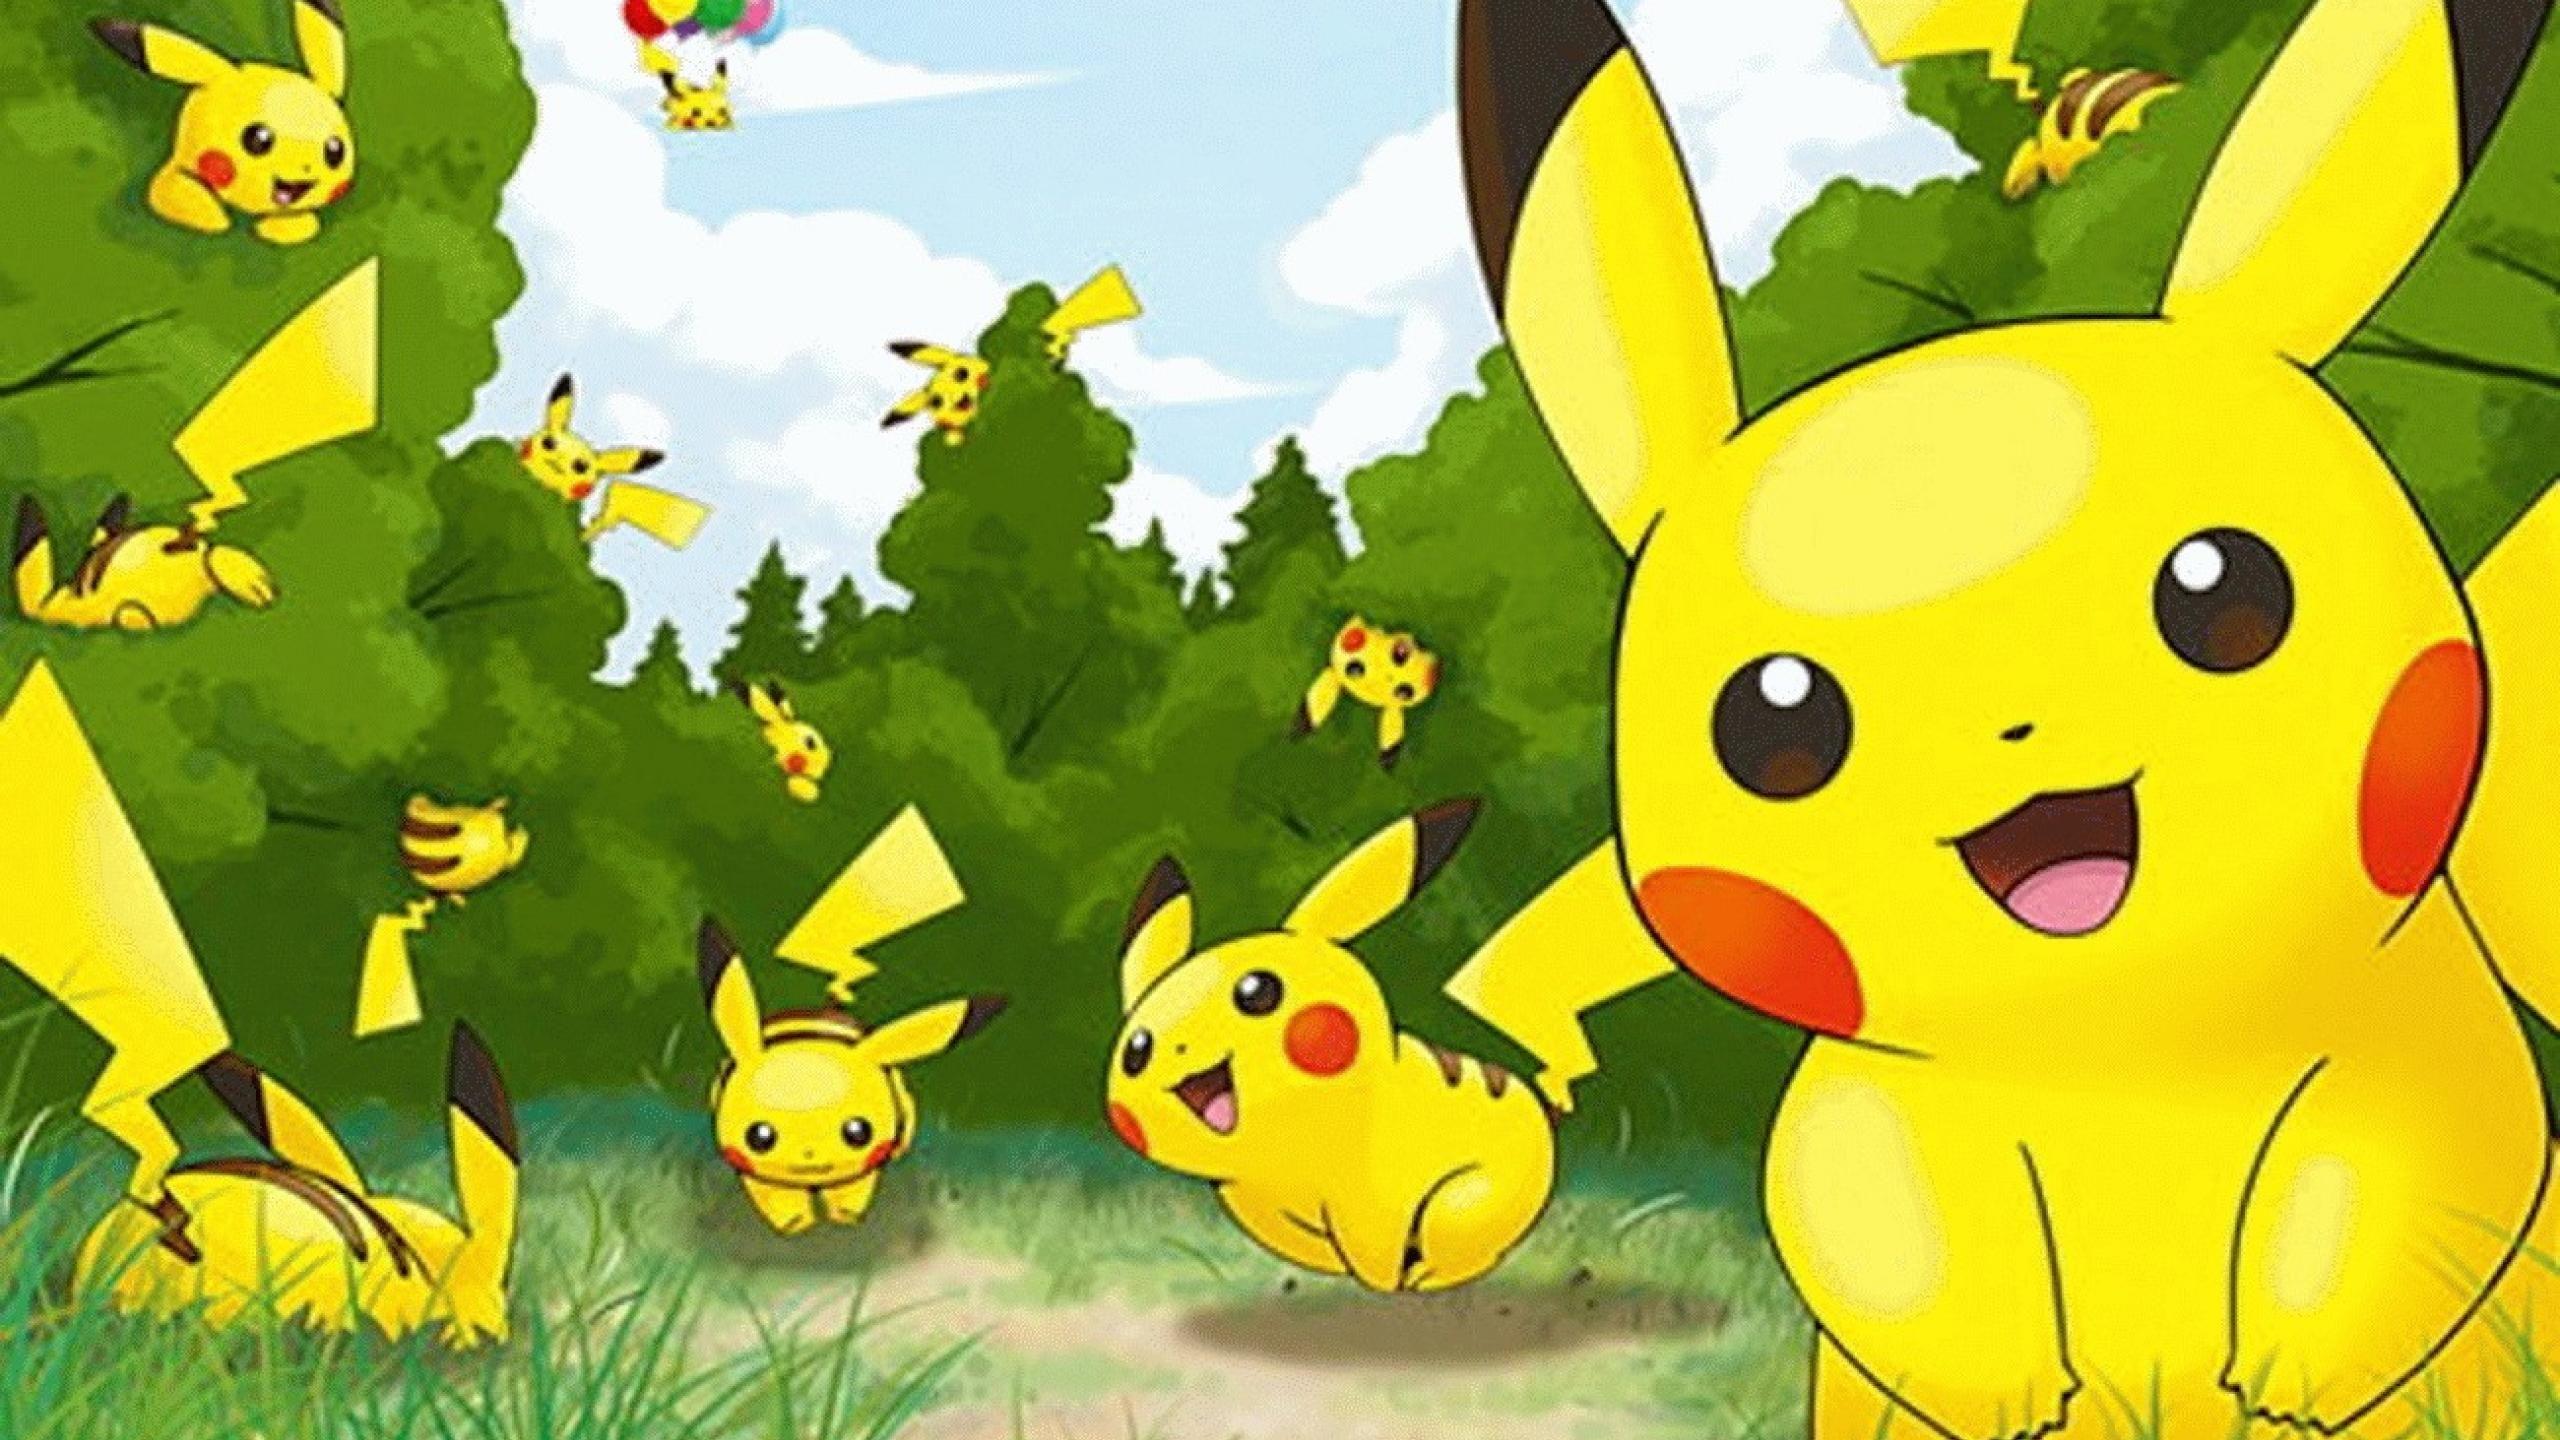 Pokemon Daily Pikachu Pikachu Pikachu Evergiftz Cute Pokemon Wallpaper Ash And Pikachu Cool Pokemon Wallpapers